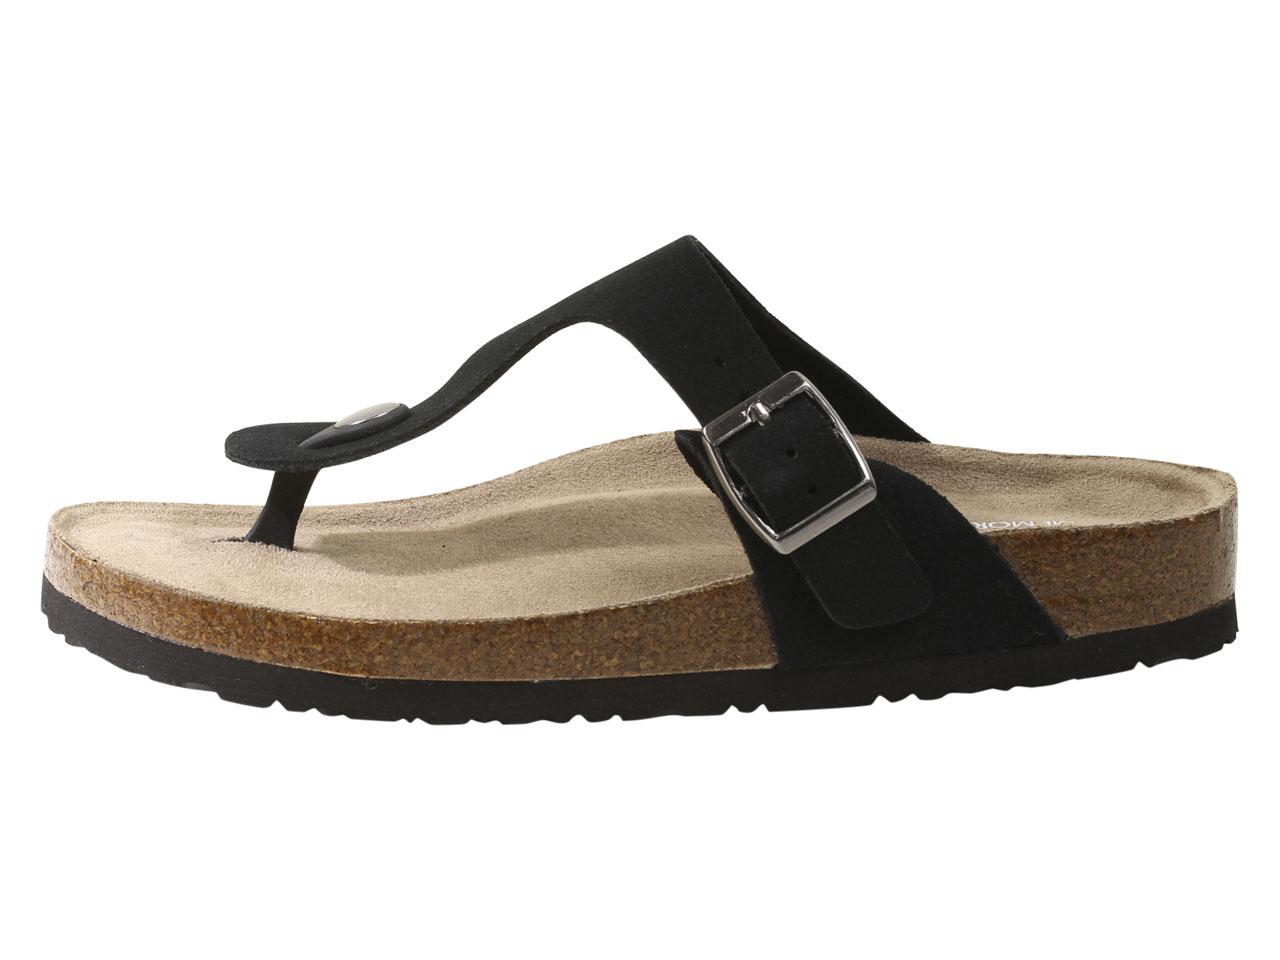 1b49ccd1d6232 Skechers Women s Granola Pyramids Memory Foam Flip Flops Sandals ...